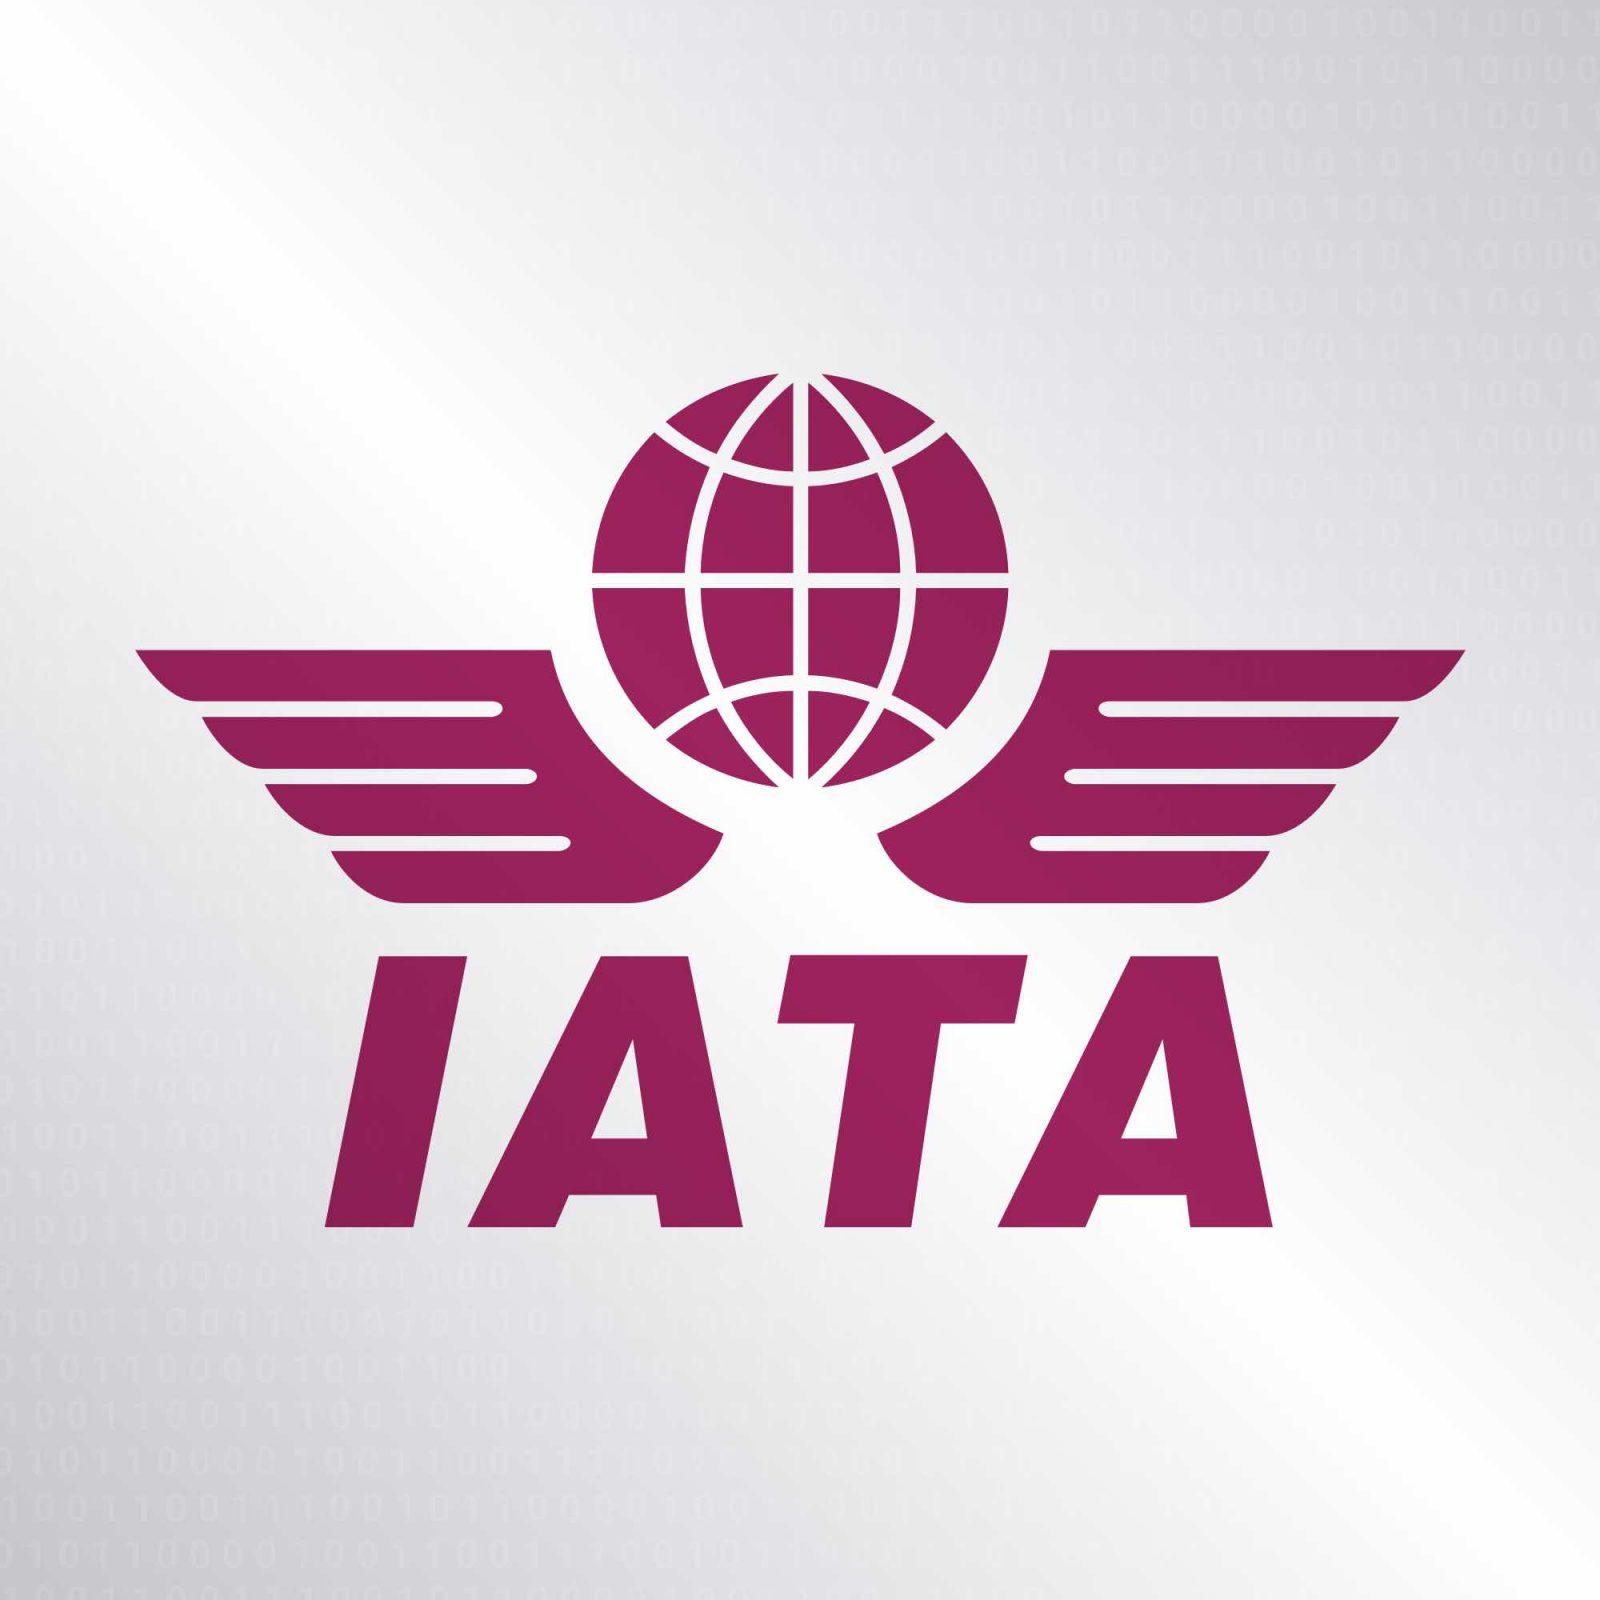 IATA logotype